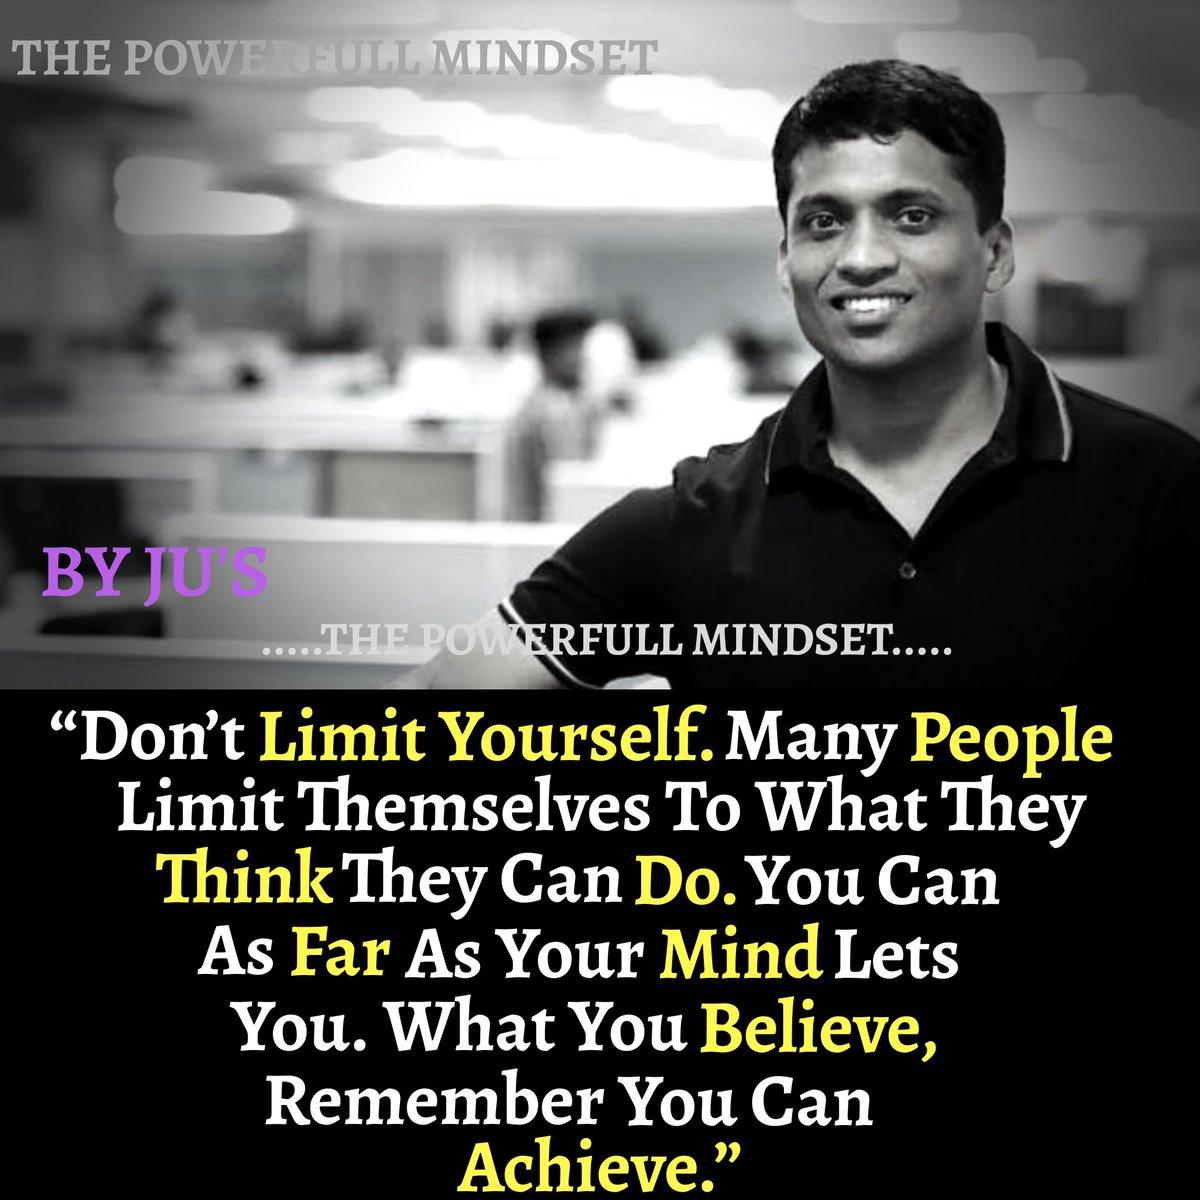 #entrepreneurshipeducation #mindsetmatters #achivement #focusonyourgoals #Trending  @ByjuRaveendranpic.twitter.com/yVfleGtPOa